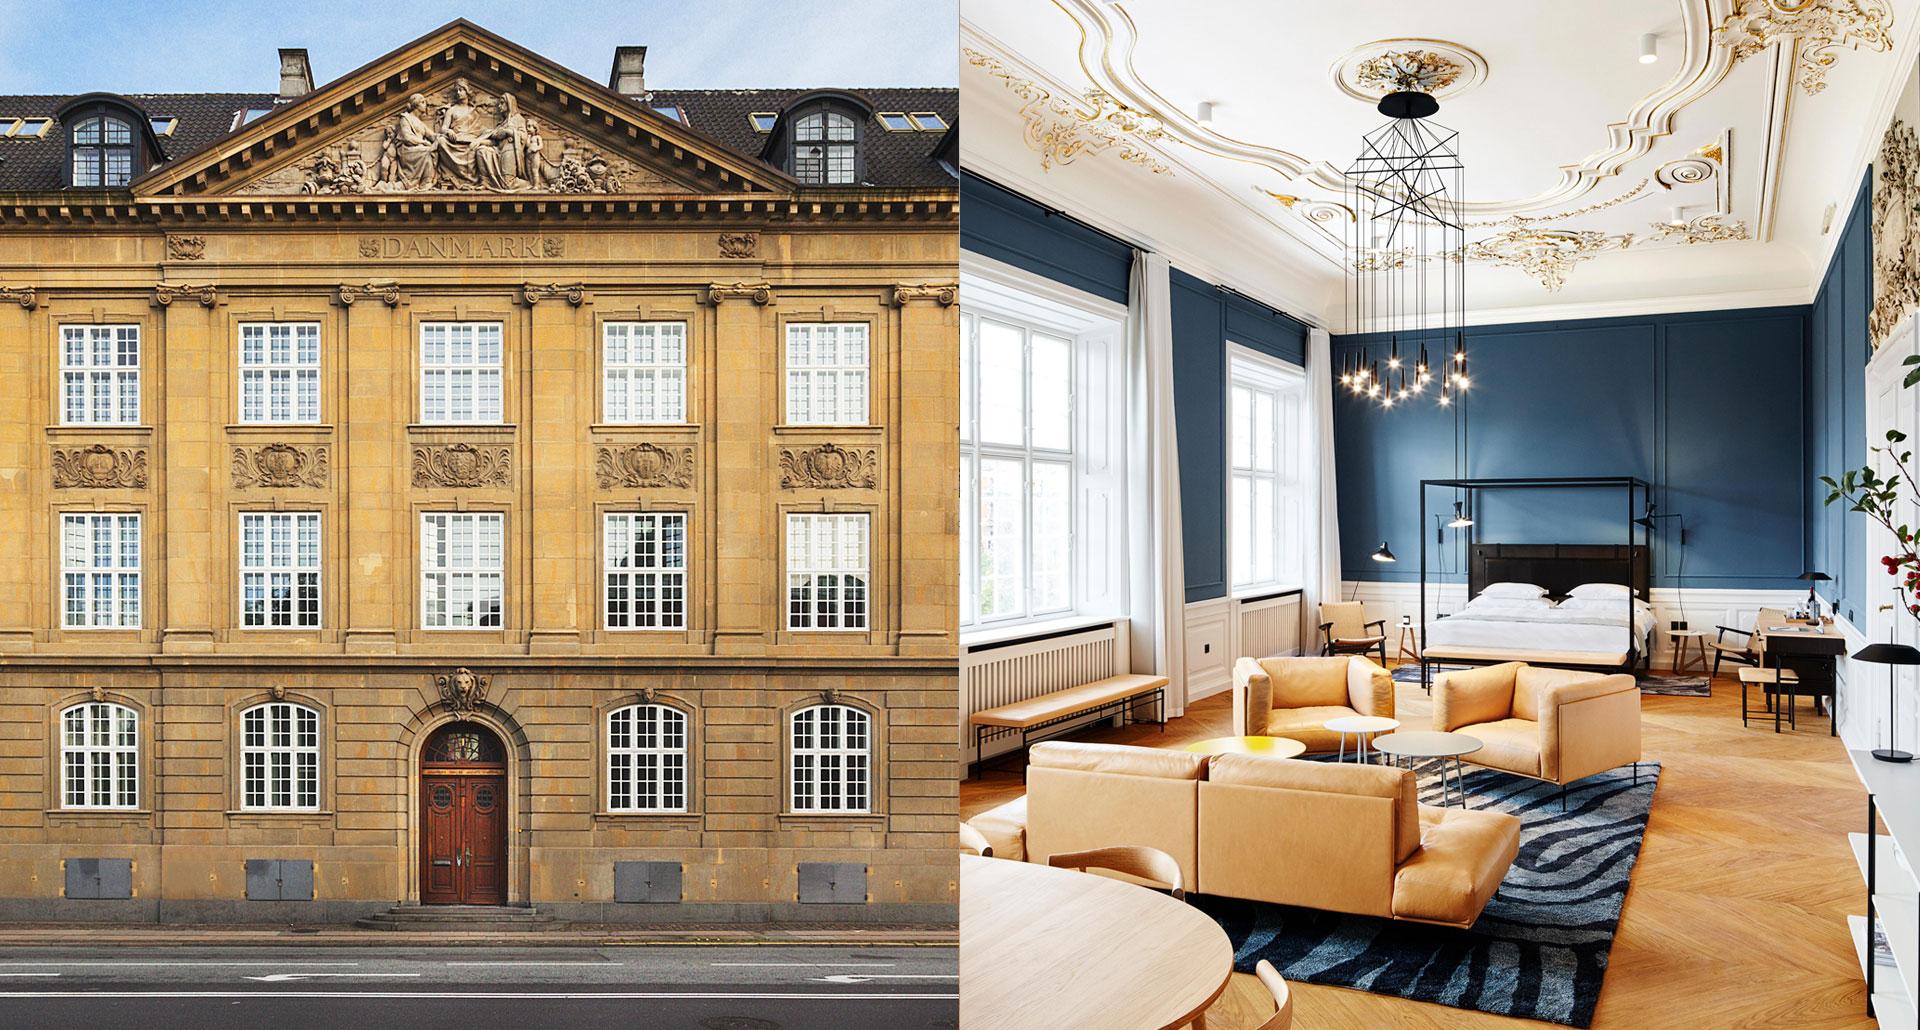 Nobis Hotel boutique hotel in Copenhagen, Denmark